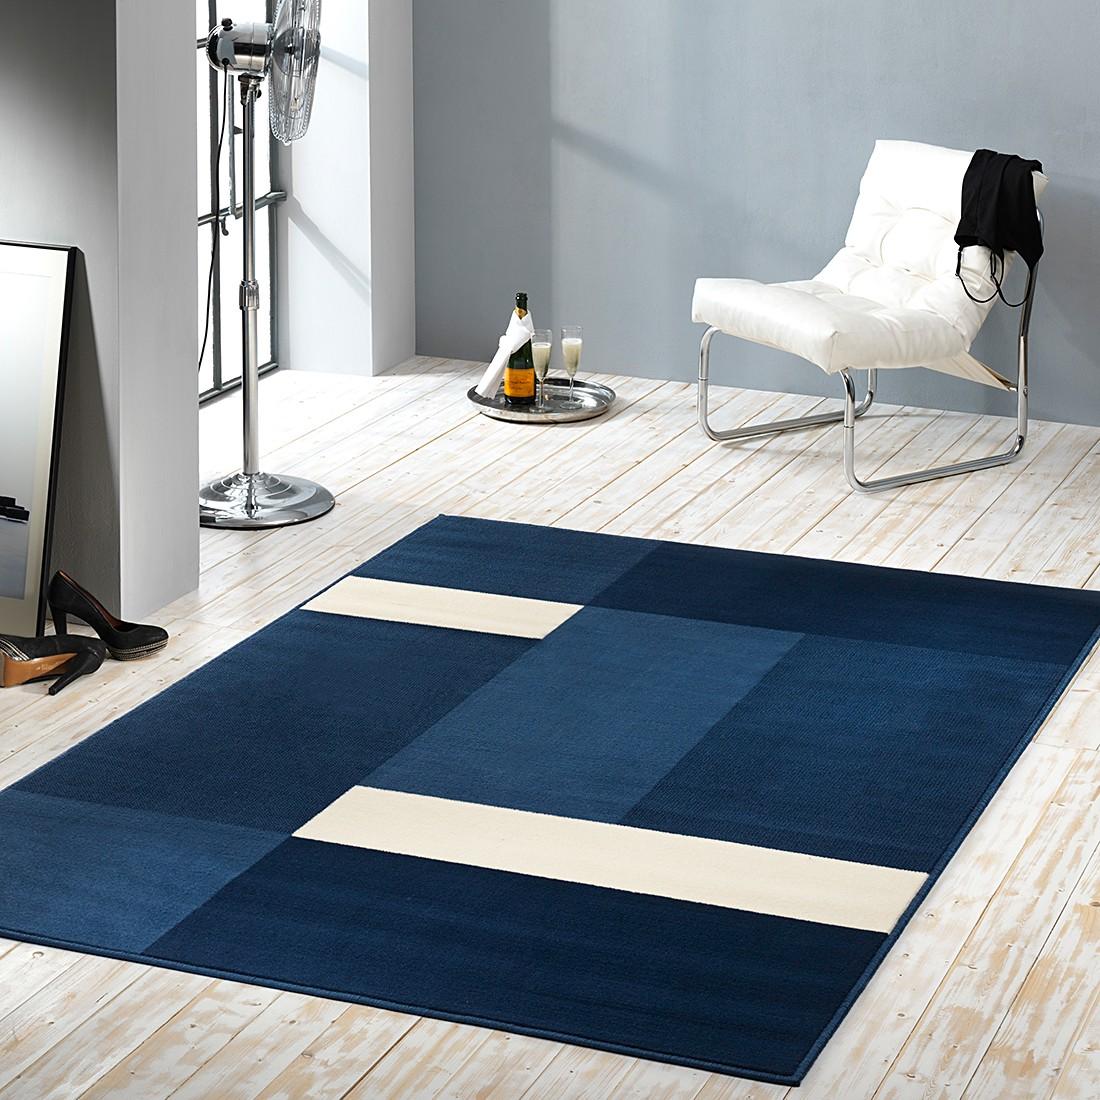 teppich prime pile blau 70 cm x 140 cm hanse home collection g nstig bestellen. Black Bedroom Furniture Sets. Home Design Ideas